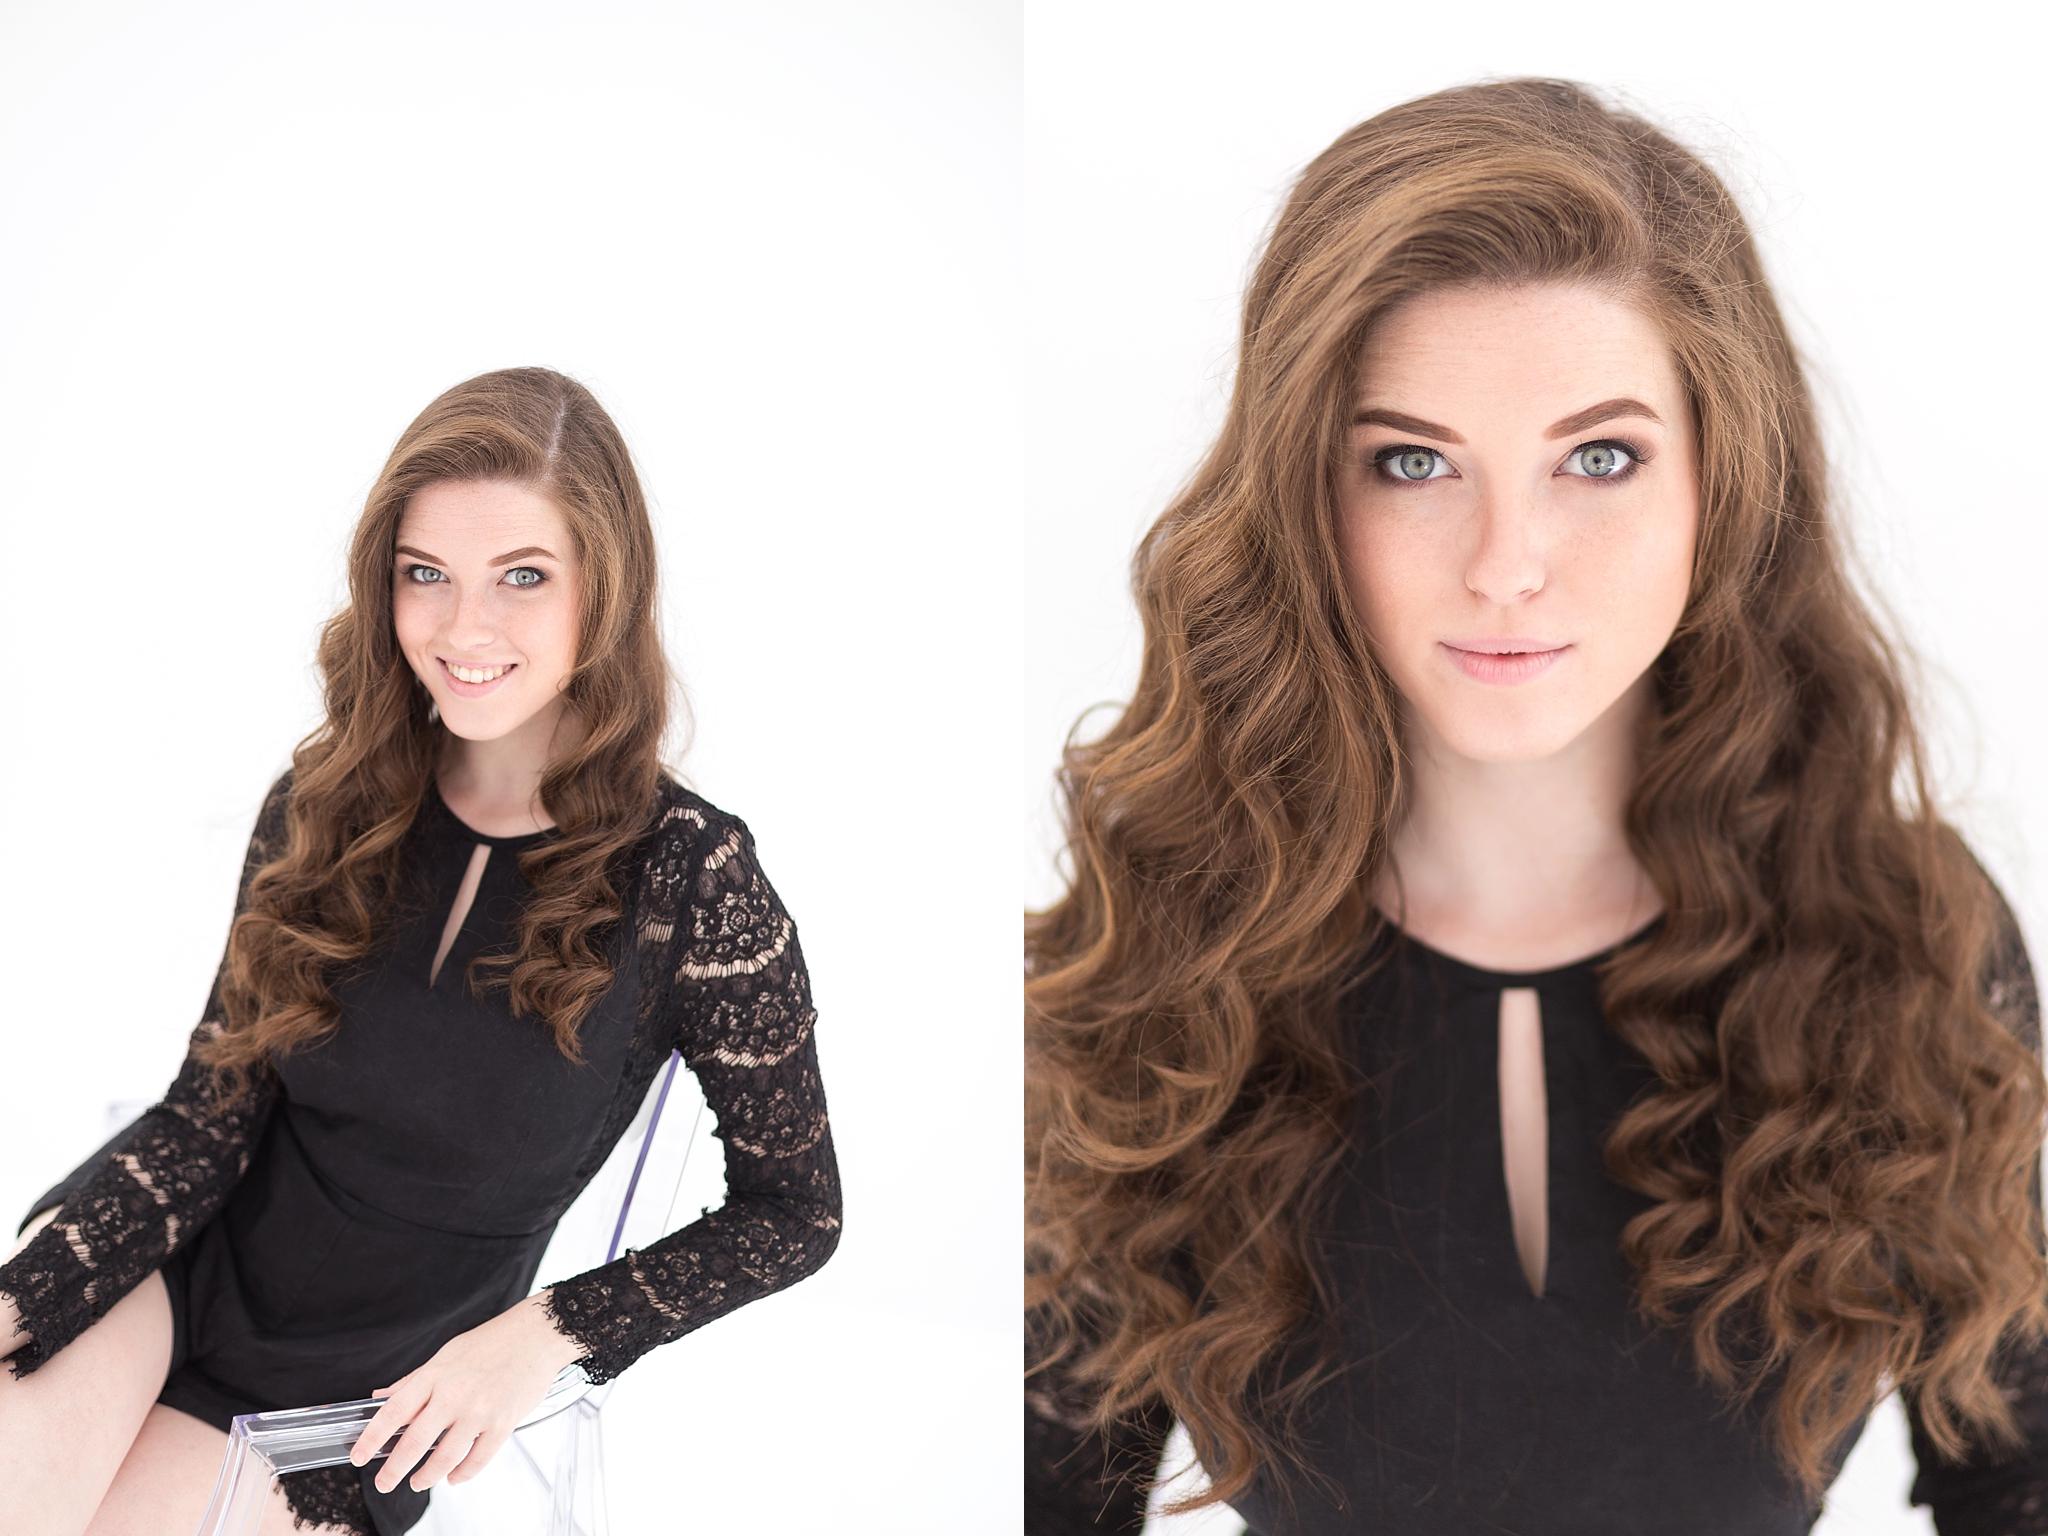 Amber-Nicole-Photography-Momni-fashion_0008.jpg